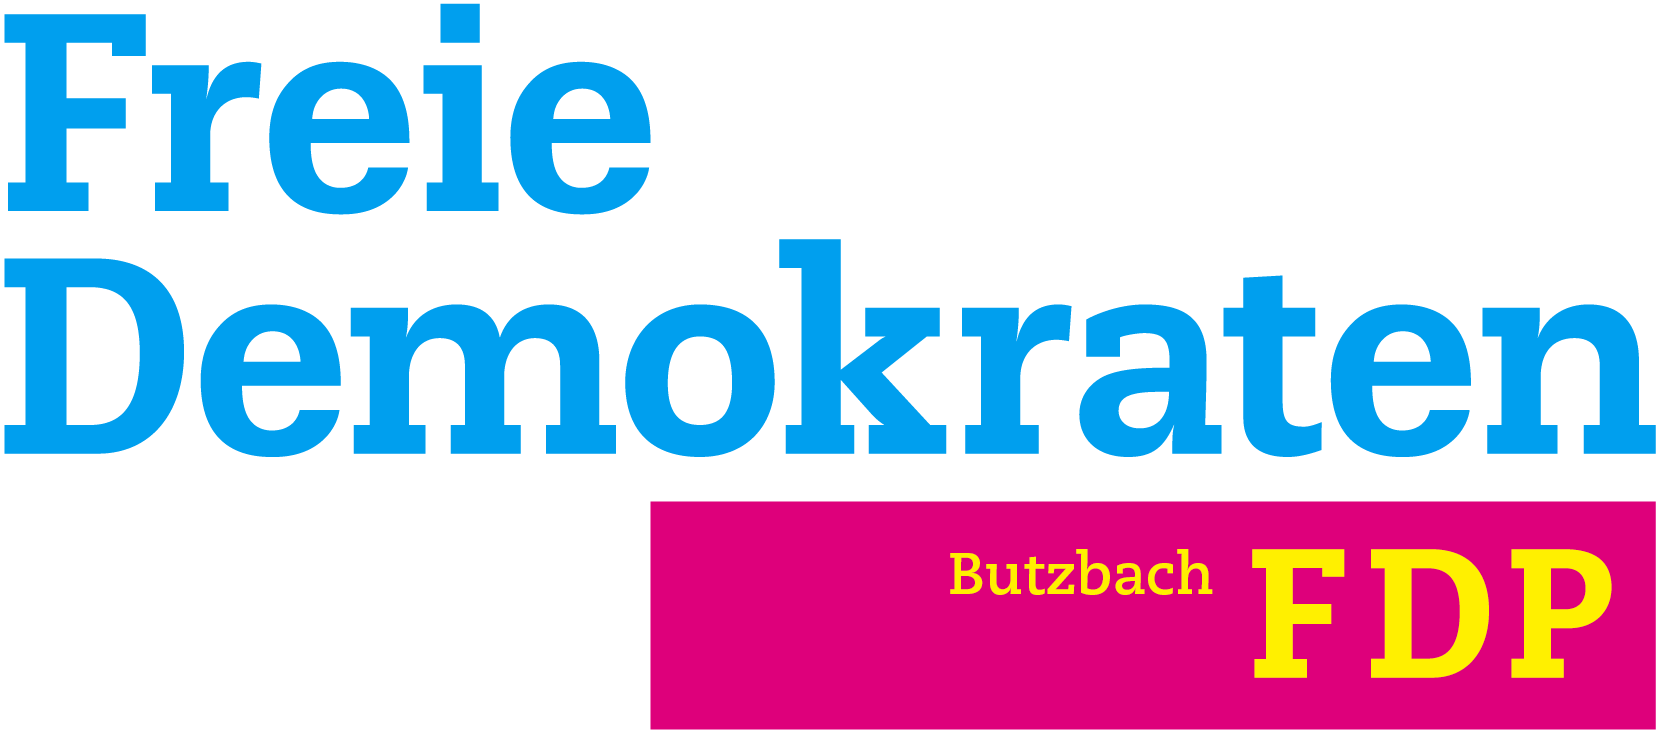 FDP Butzbach